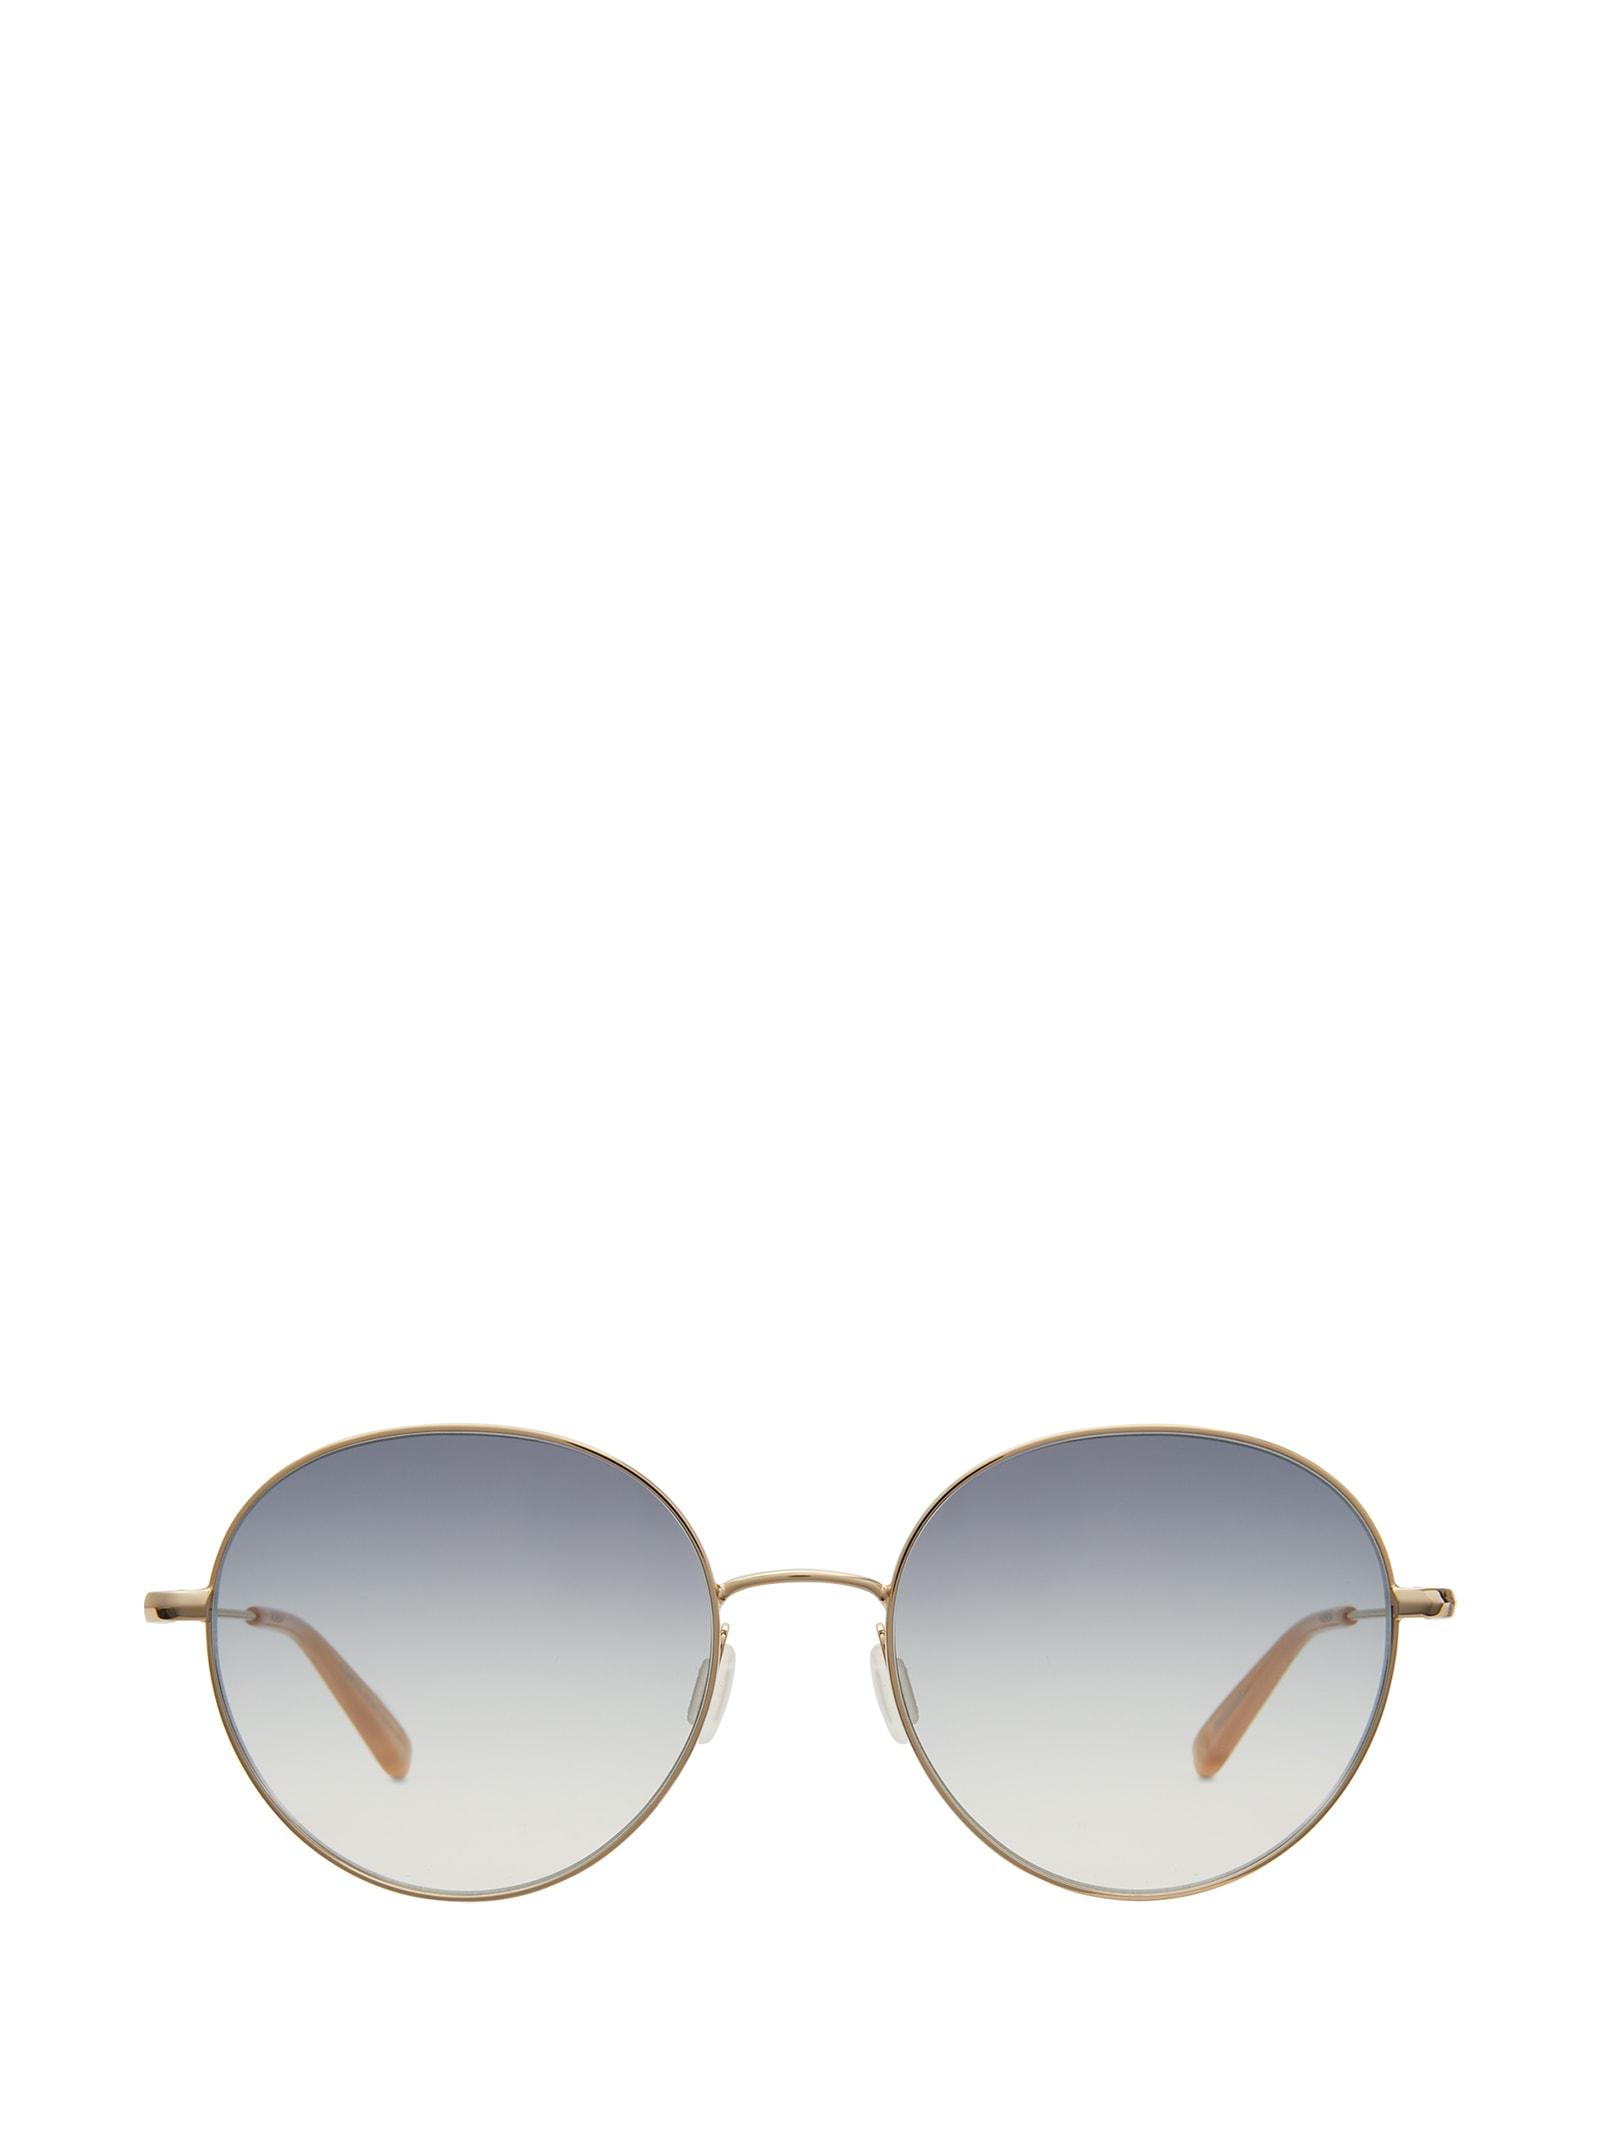 Garrett Leight Garrett Leight Valencia Sun Gold-peach Sunglasses